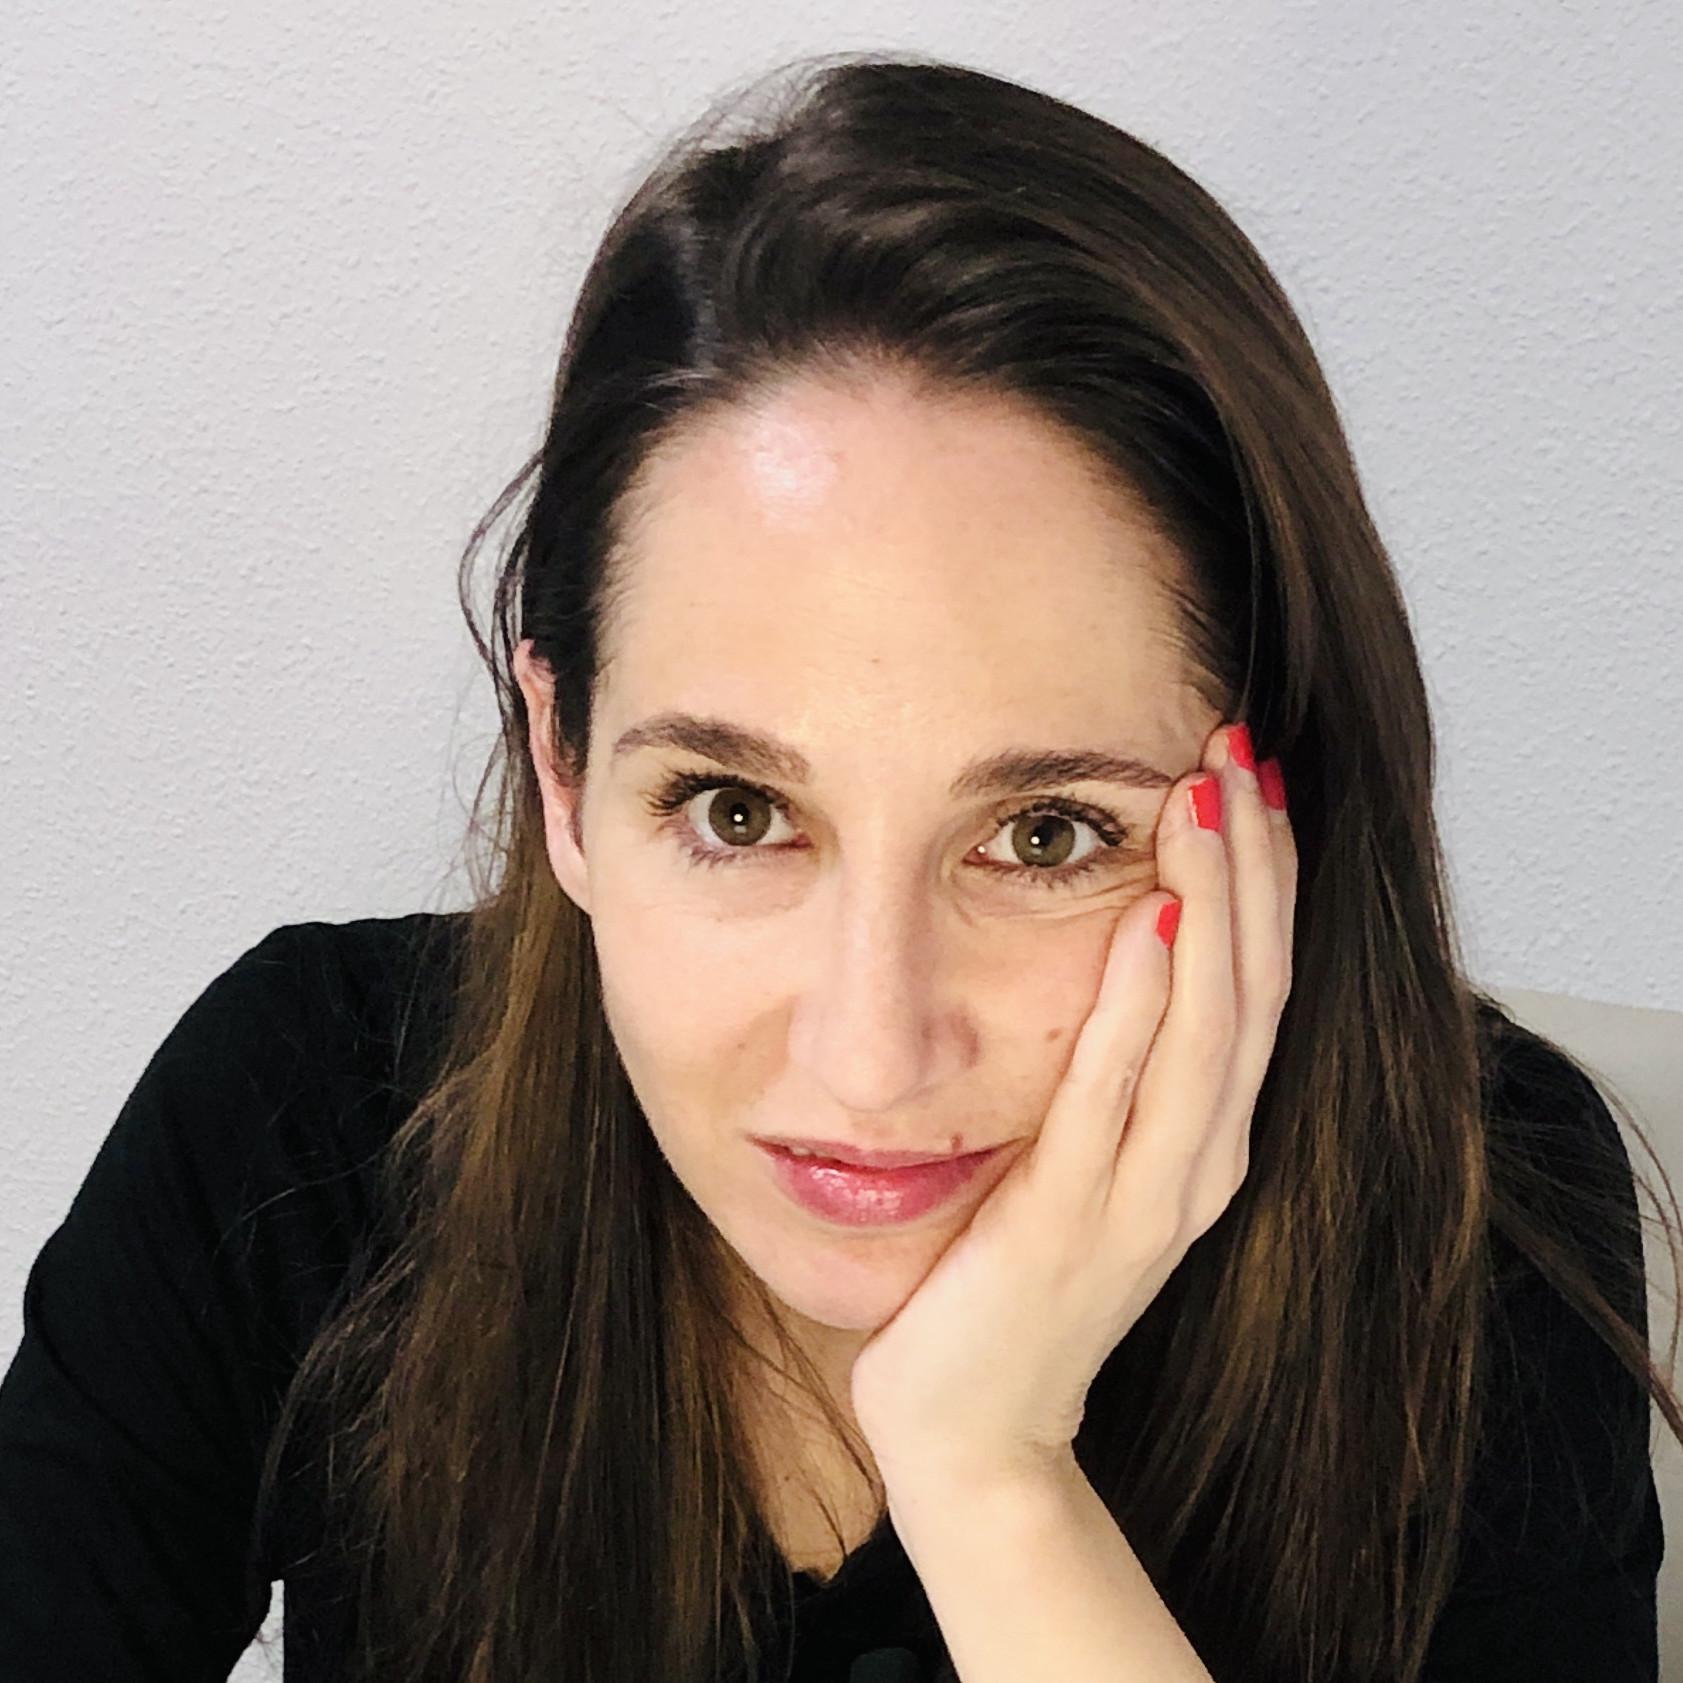 Mariona Gumpert